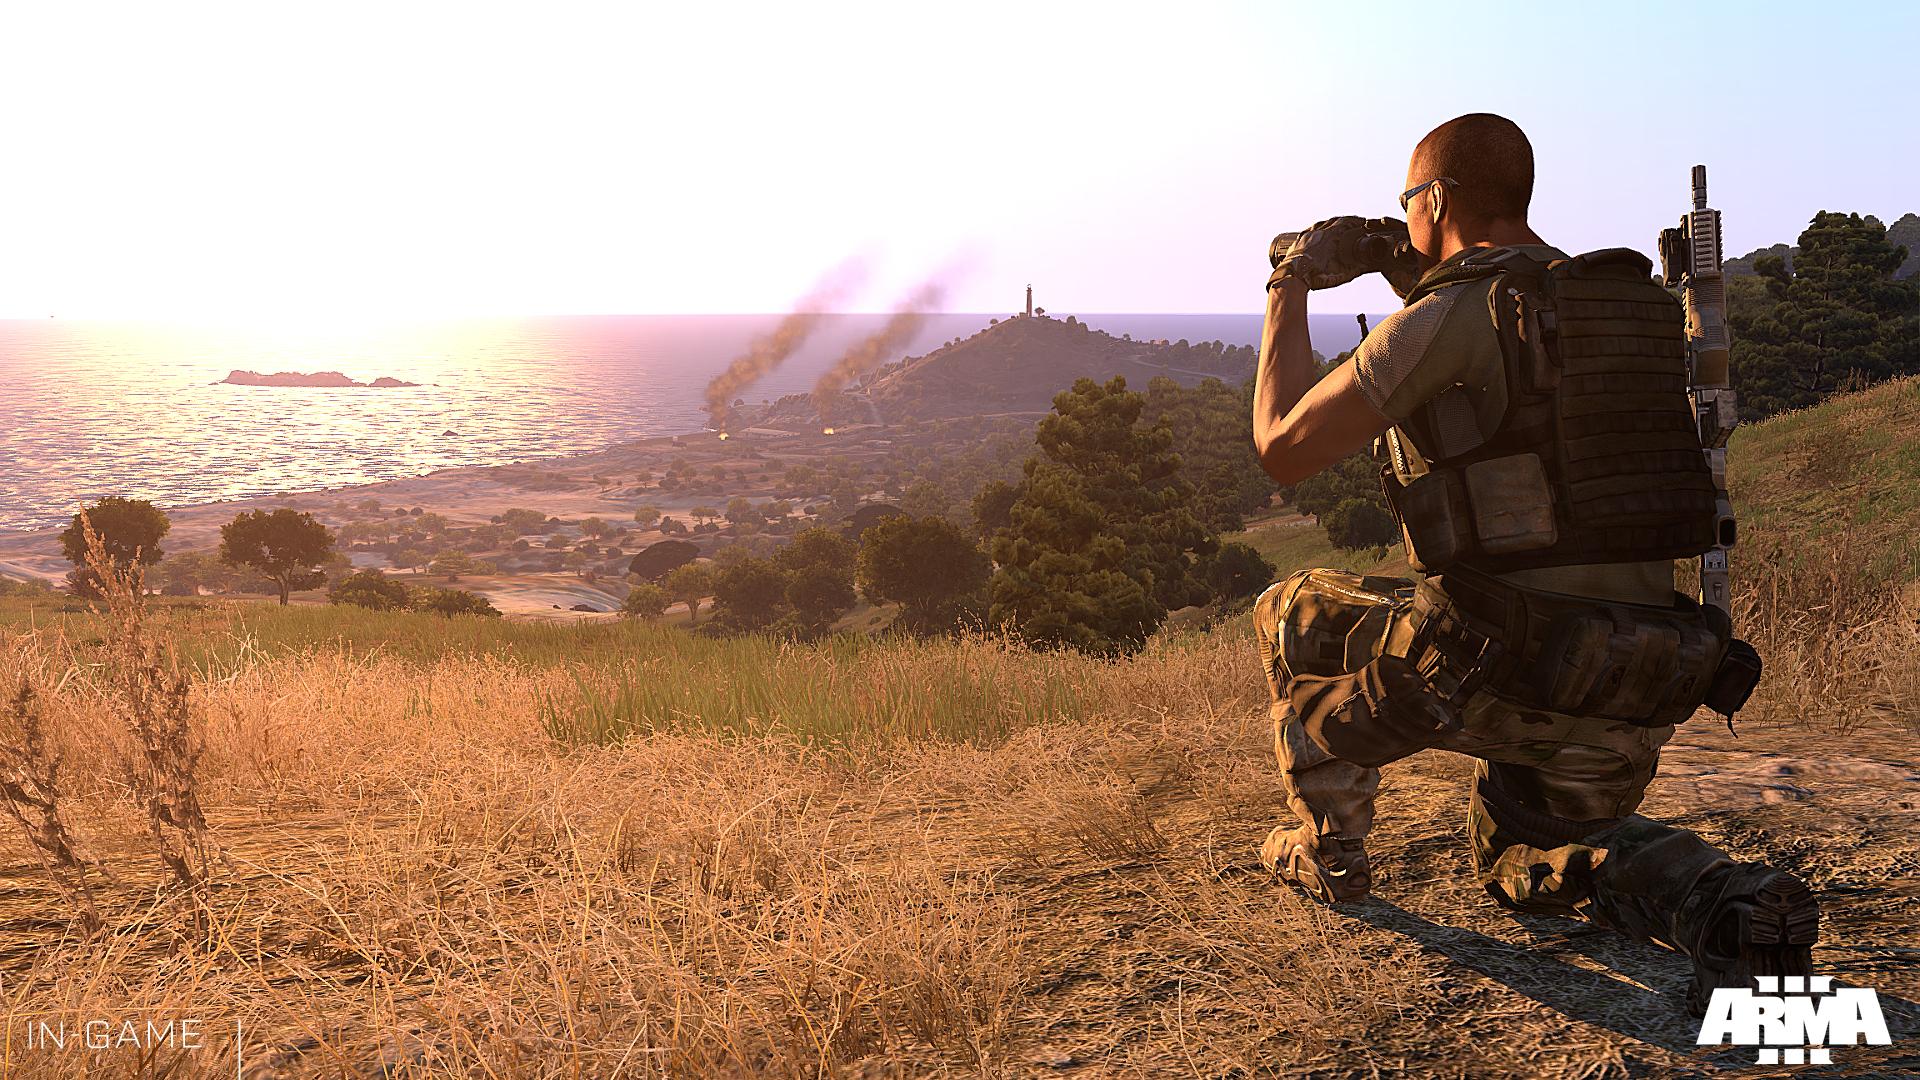 arma 3 sniper screenshots with Arma 3 Wallpaper Hd on Sniper Elite 3 Review as well Arma 3 Wallpaper Hd furthermore Call Of Duty Infinite Warfare Ganha Novas Imagens 42615 furthermore Dayz Standalone Wallpapers besides 43704 Fn P90 Mkii.